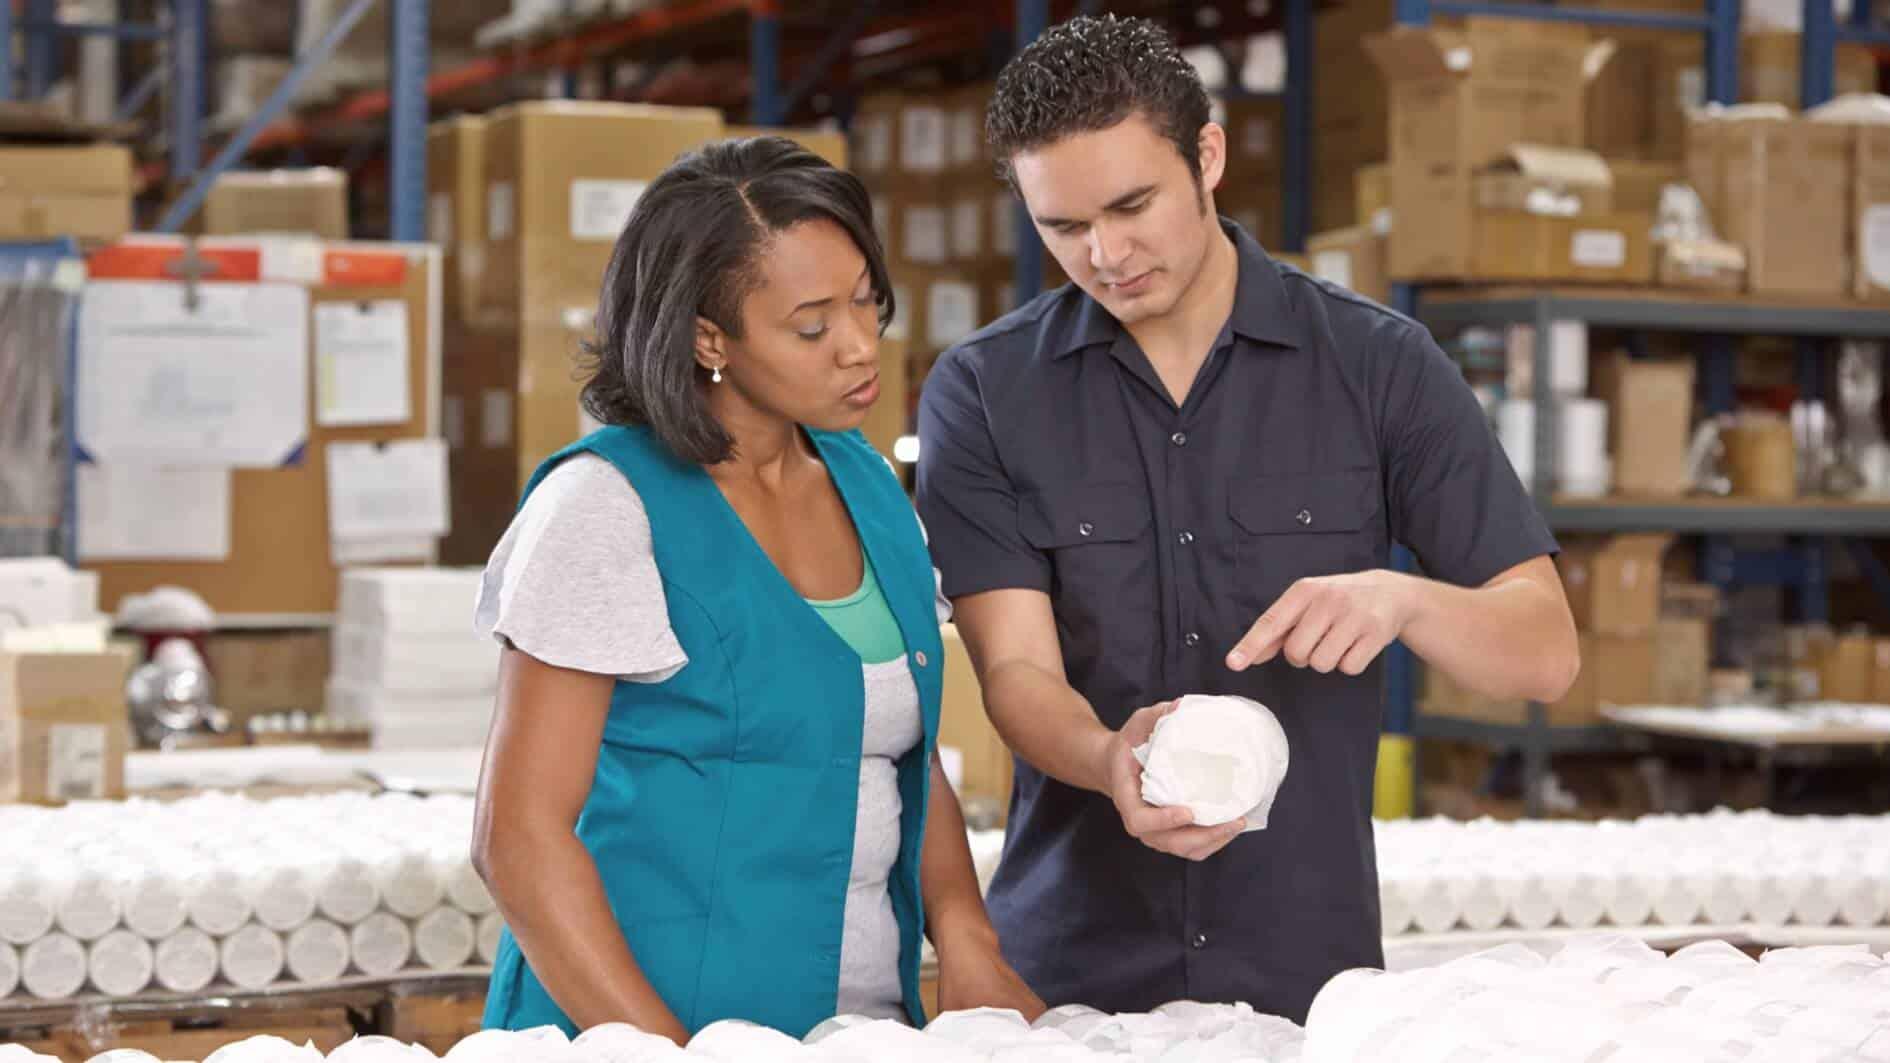 Pelatihan dan Pengembangan Karyawan Baru Manufaktur, Perlukah?